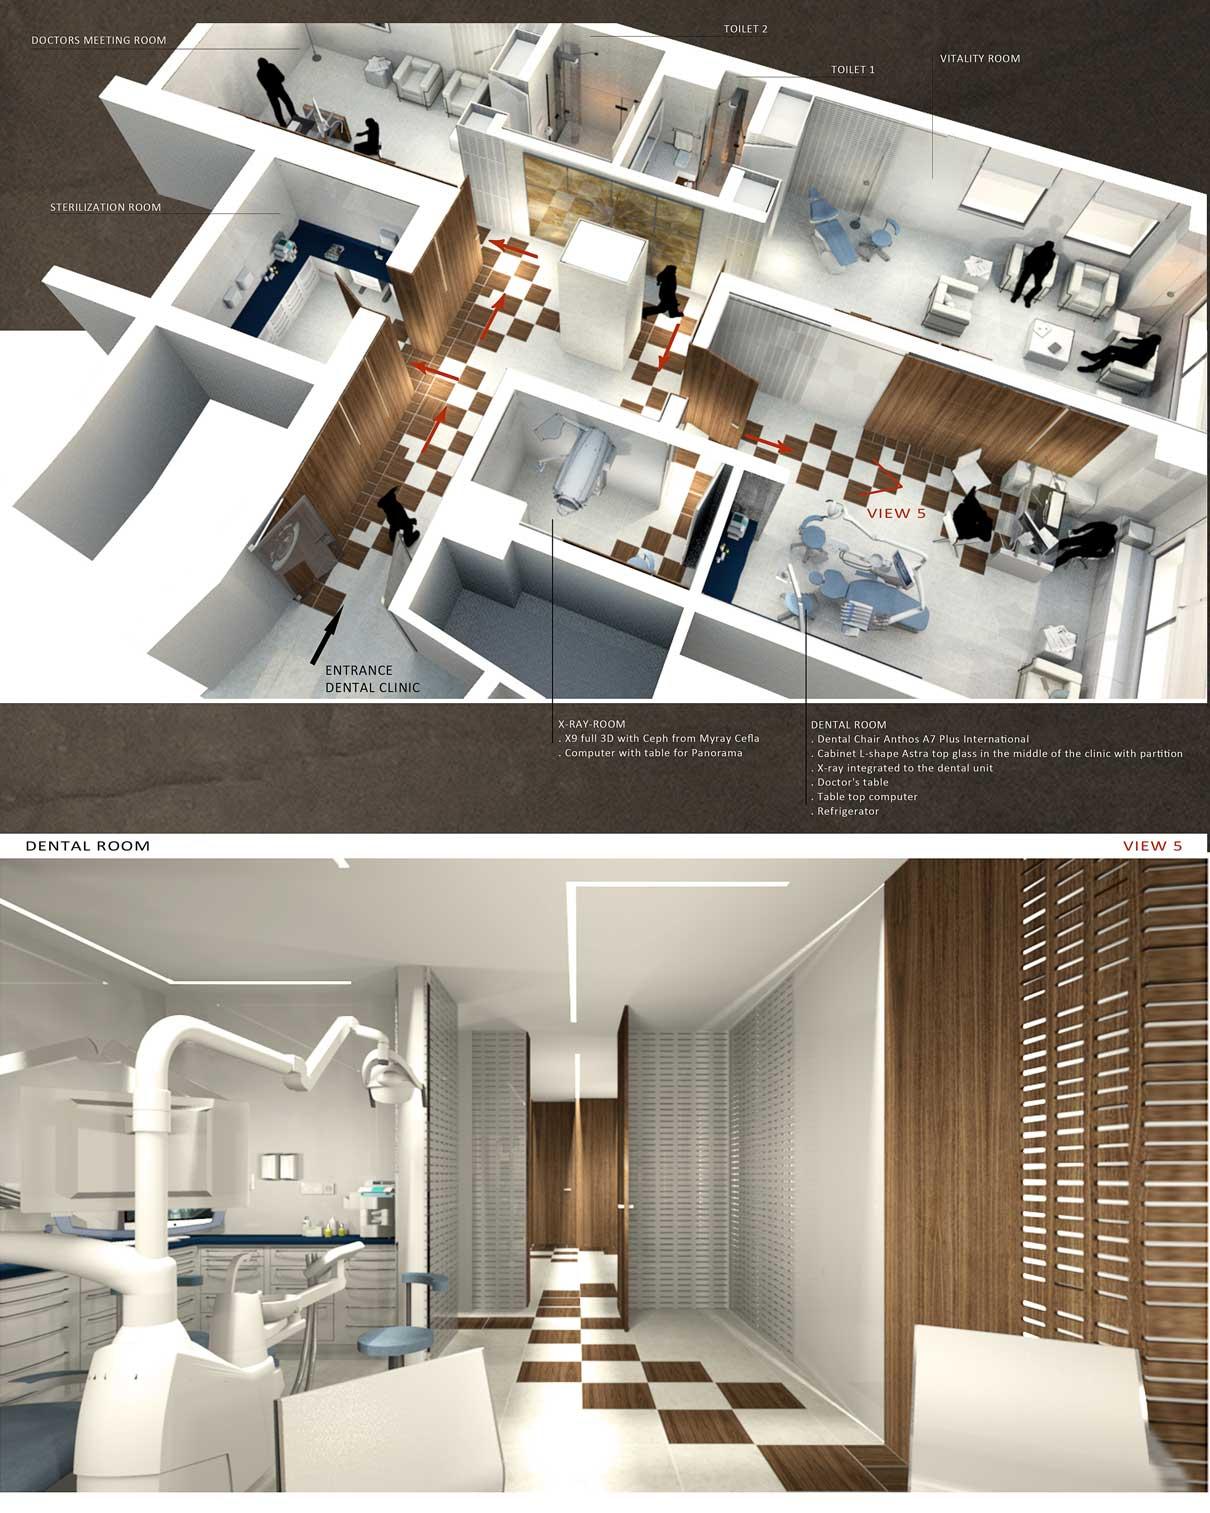 Clinica-dentale-Qatar_14